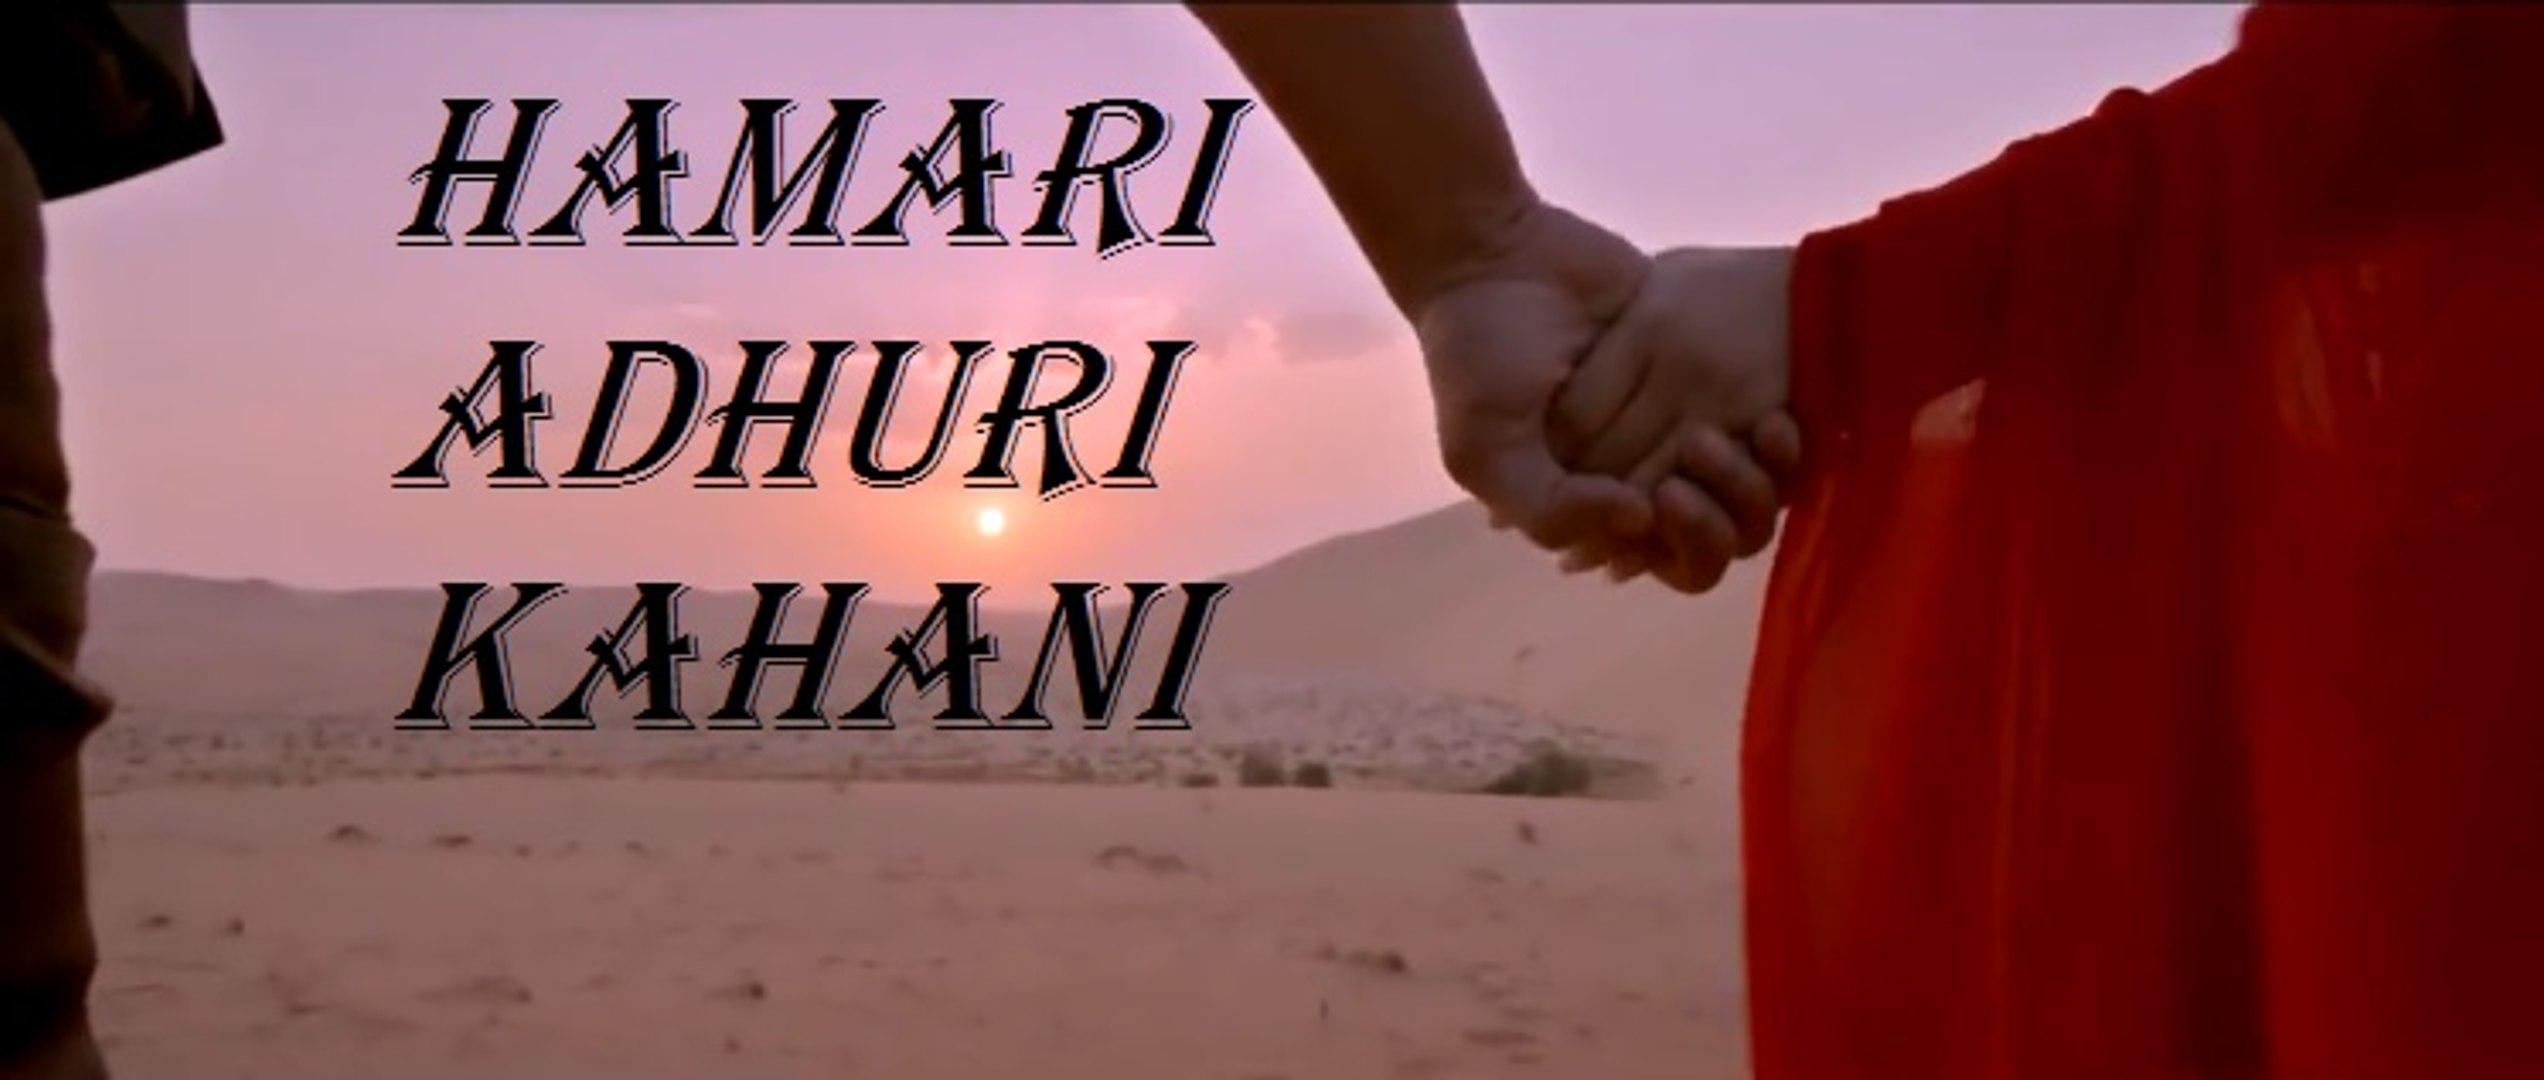 Hamari Adhuri Kahani - Theatrical Trailer - Hamari Adhuri Kahaani Bollywood Movie - Emraan Hashmi Vi